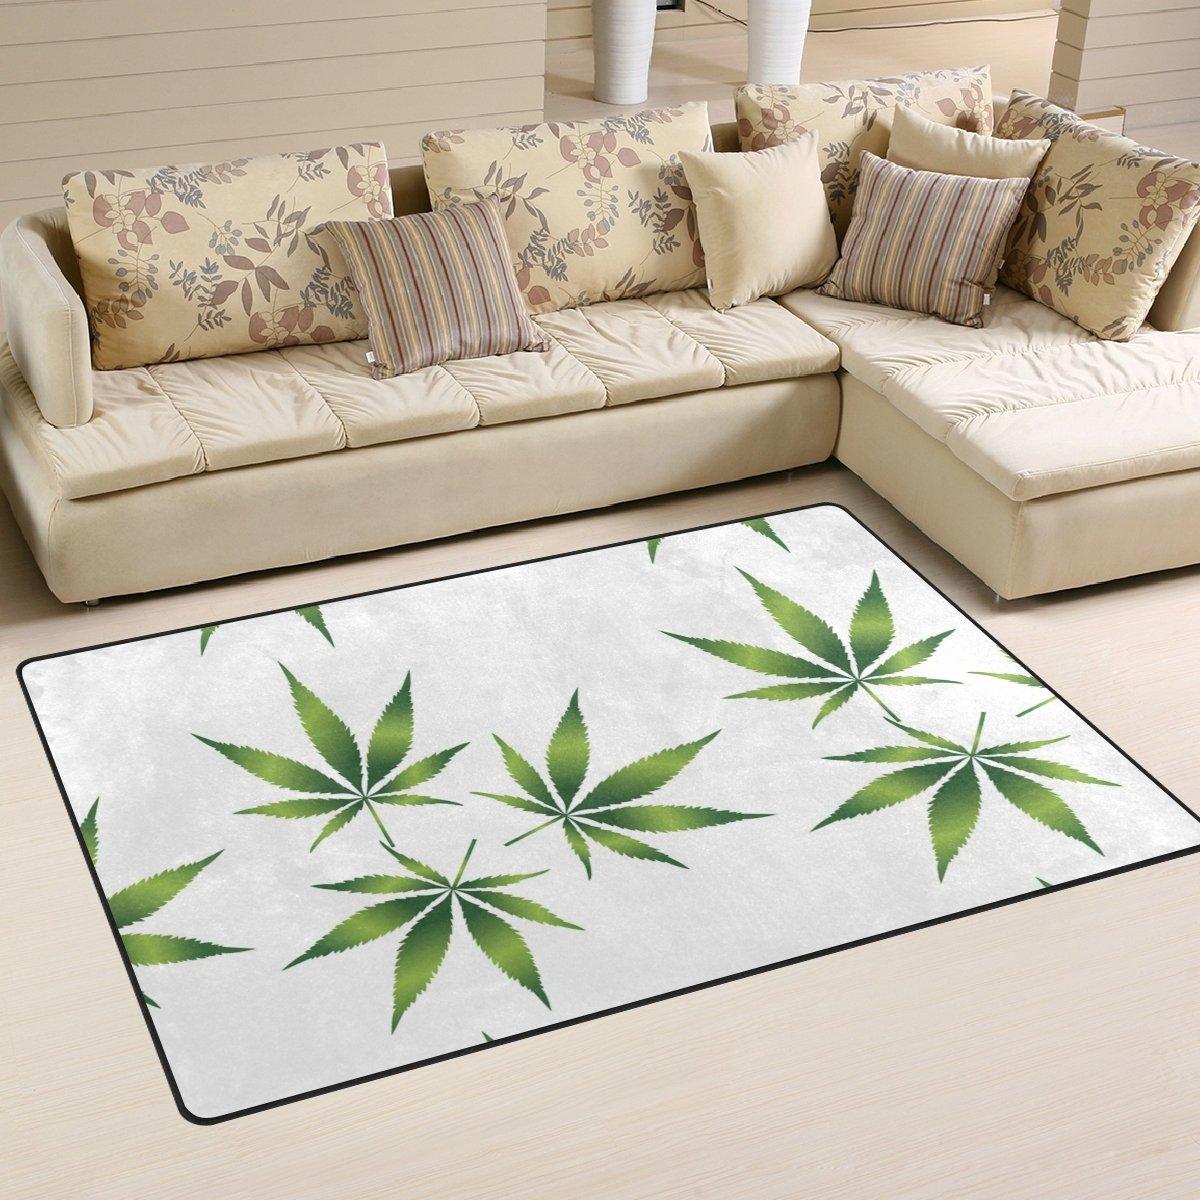 Bennigiry Cannabis Leaf Pattern Area Rug Carpet Non-Slip Floor Mat Doormats for Living Room Bedroom 152.4 x 99 cm, 60 x 39 inch